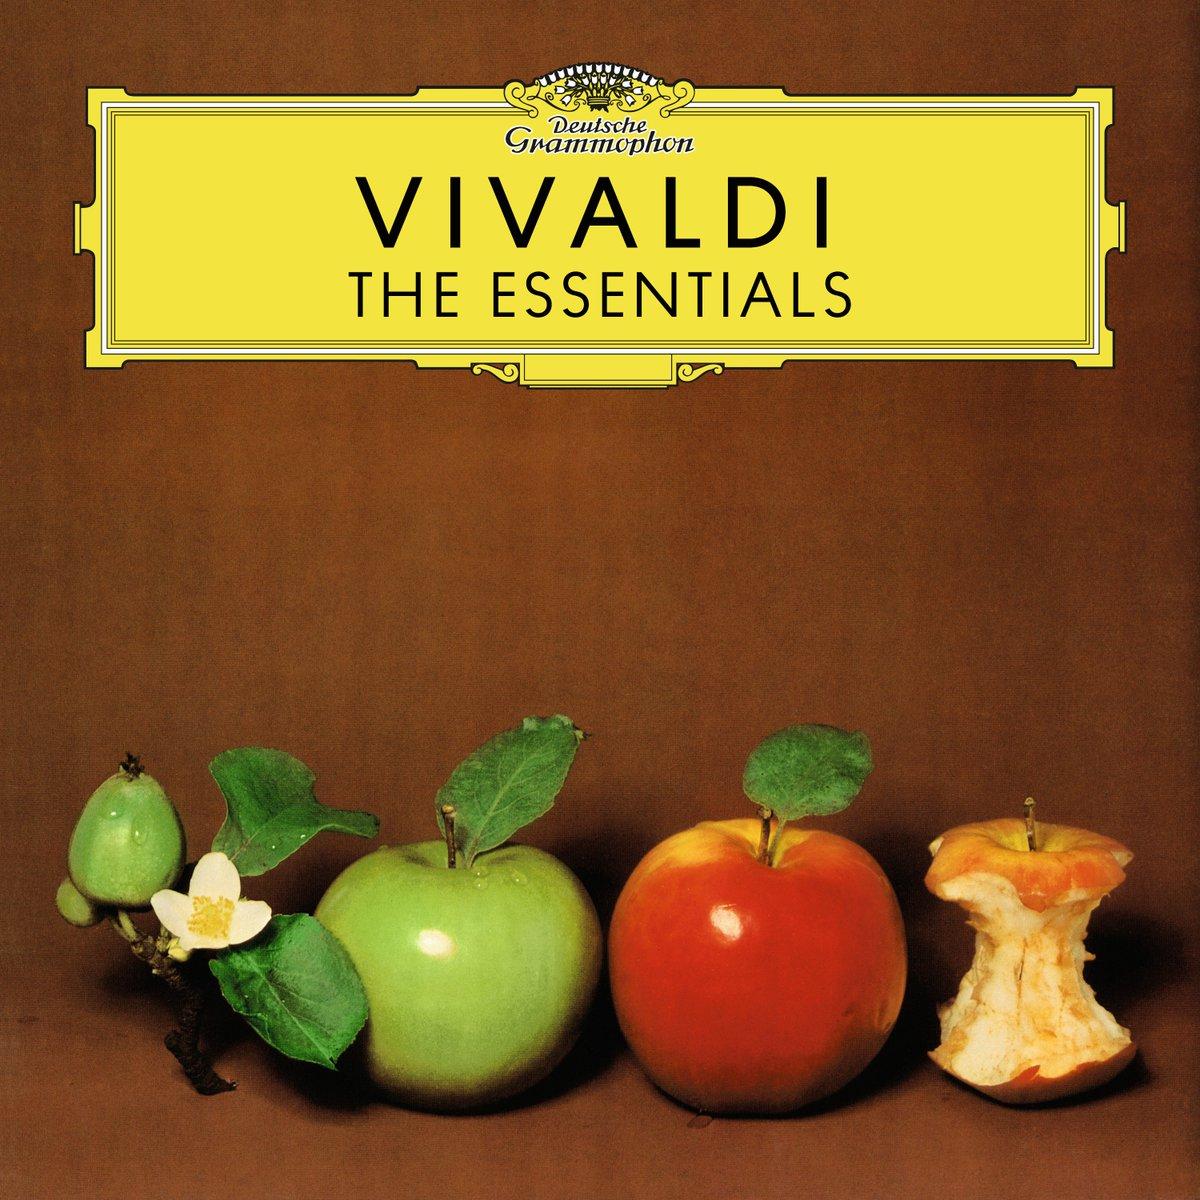 25 #Vivaldi tracks transport you to the heart of Baroque Venice! Happy listening:  http:// dg.lnk.to/VivaldiEssenti als &nbsp; … <br>http://pic.twitter.com/FchK1wd5e0